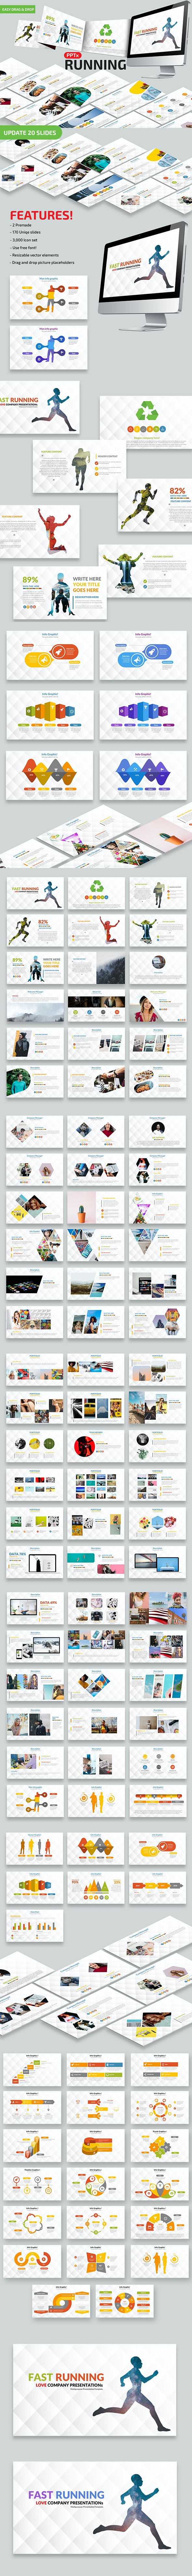 Fast Running Powerpoint - PowerPoint Templates Presentation Templates